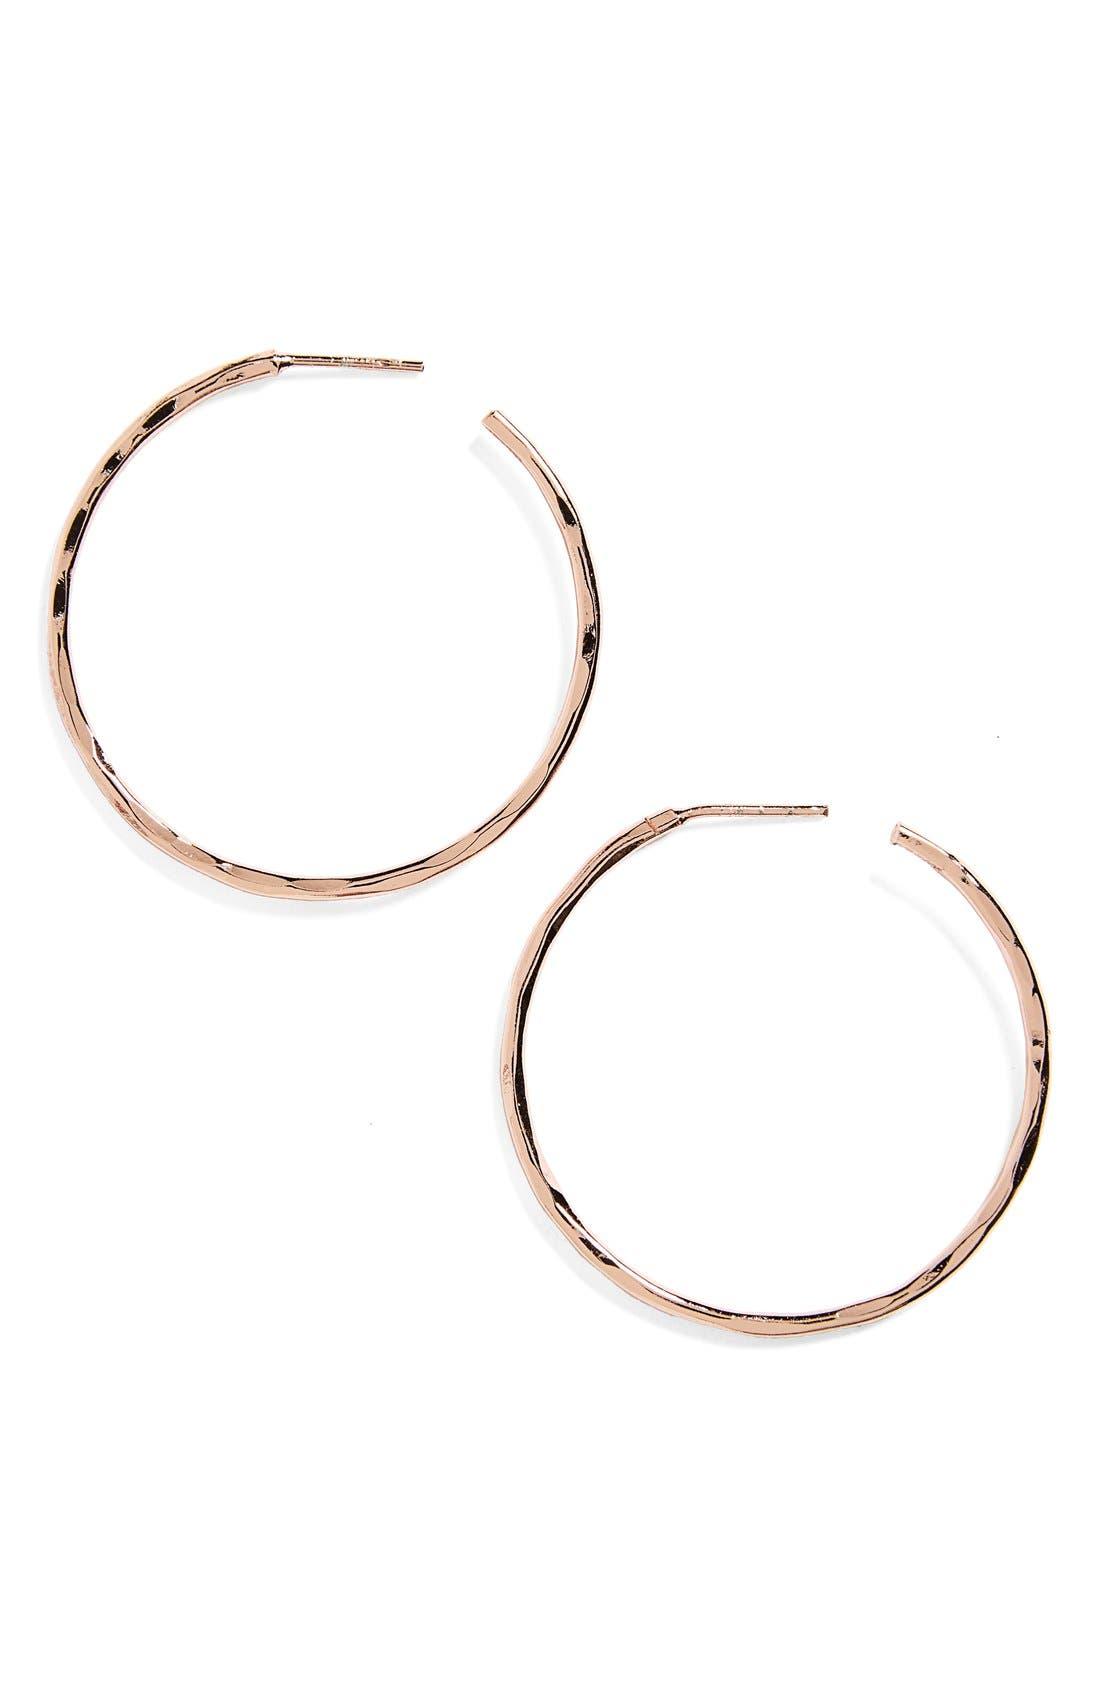 Medium Hammered Hoop Earrings,                             Main thumbnail 1, color,                             Rose Gold